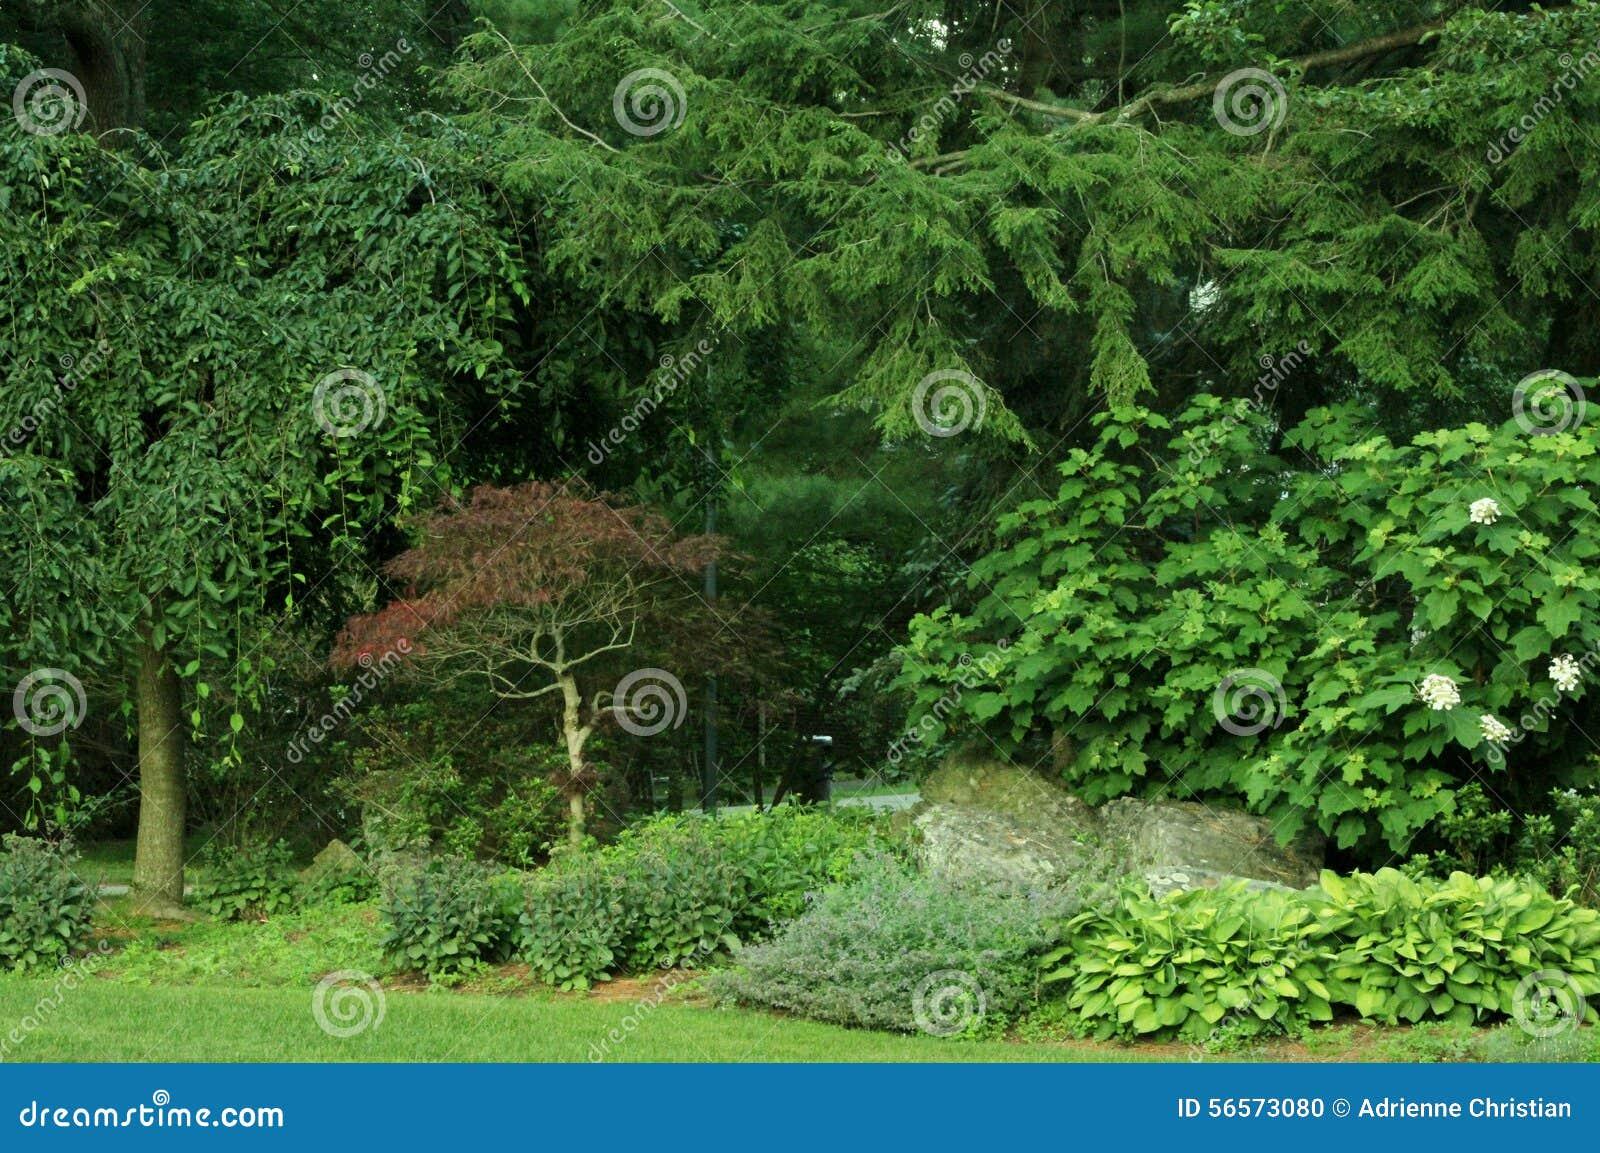 Download Ιαπωνικός σφένδαμνος στοκ εικόνες. εικόνα από τοπία, διακλαδιμένος - 56573080